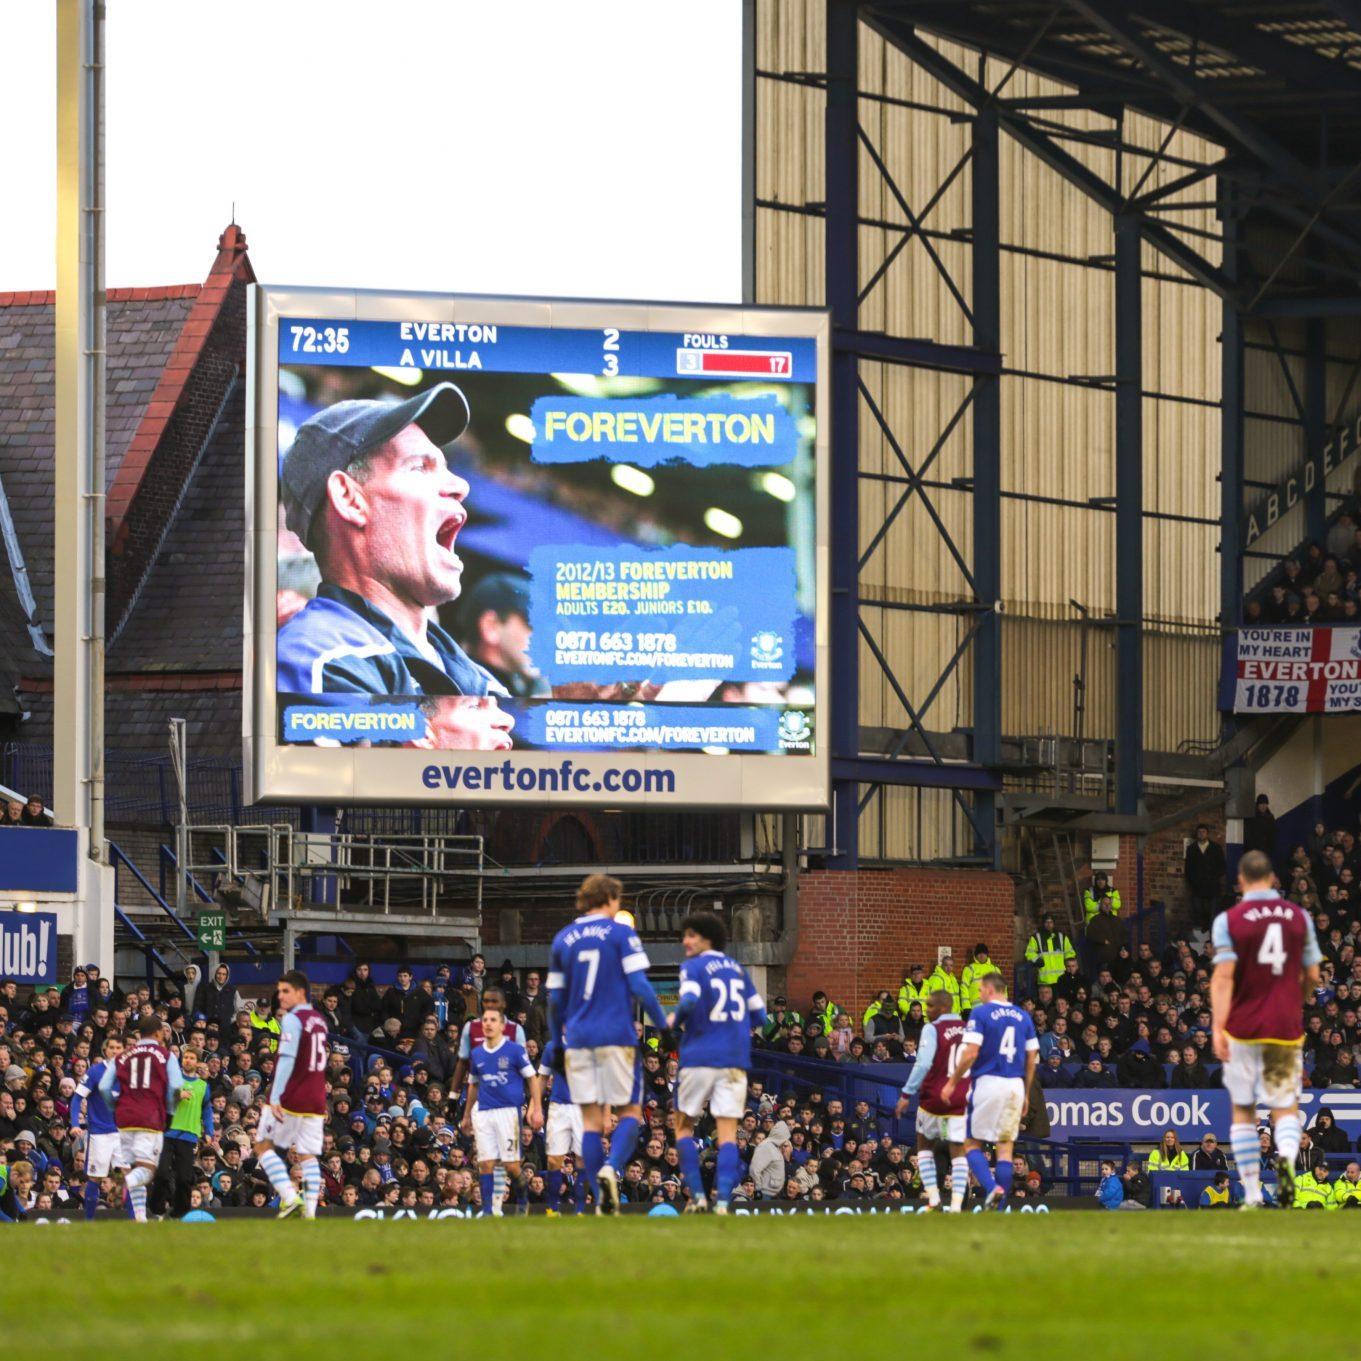 Everton-Stadium-screens-giant